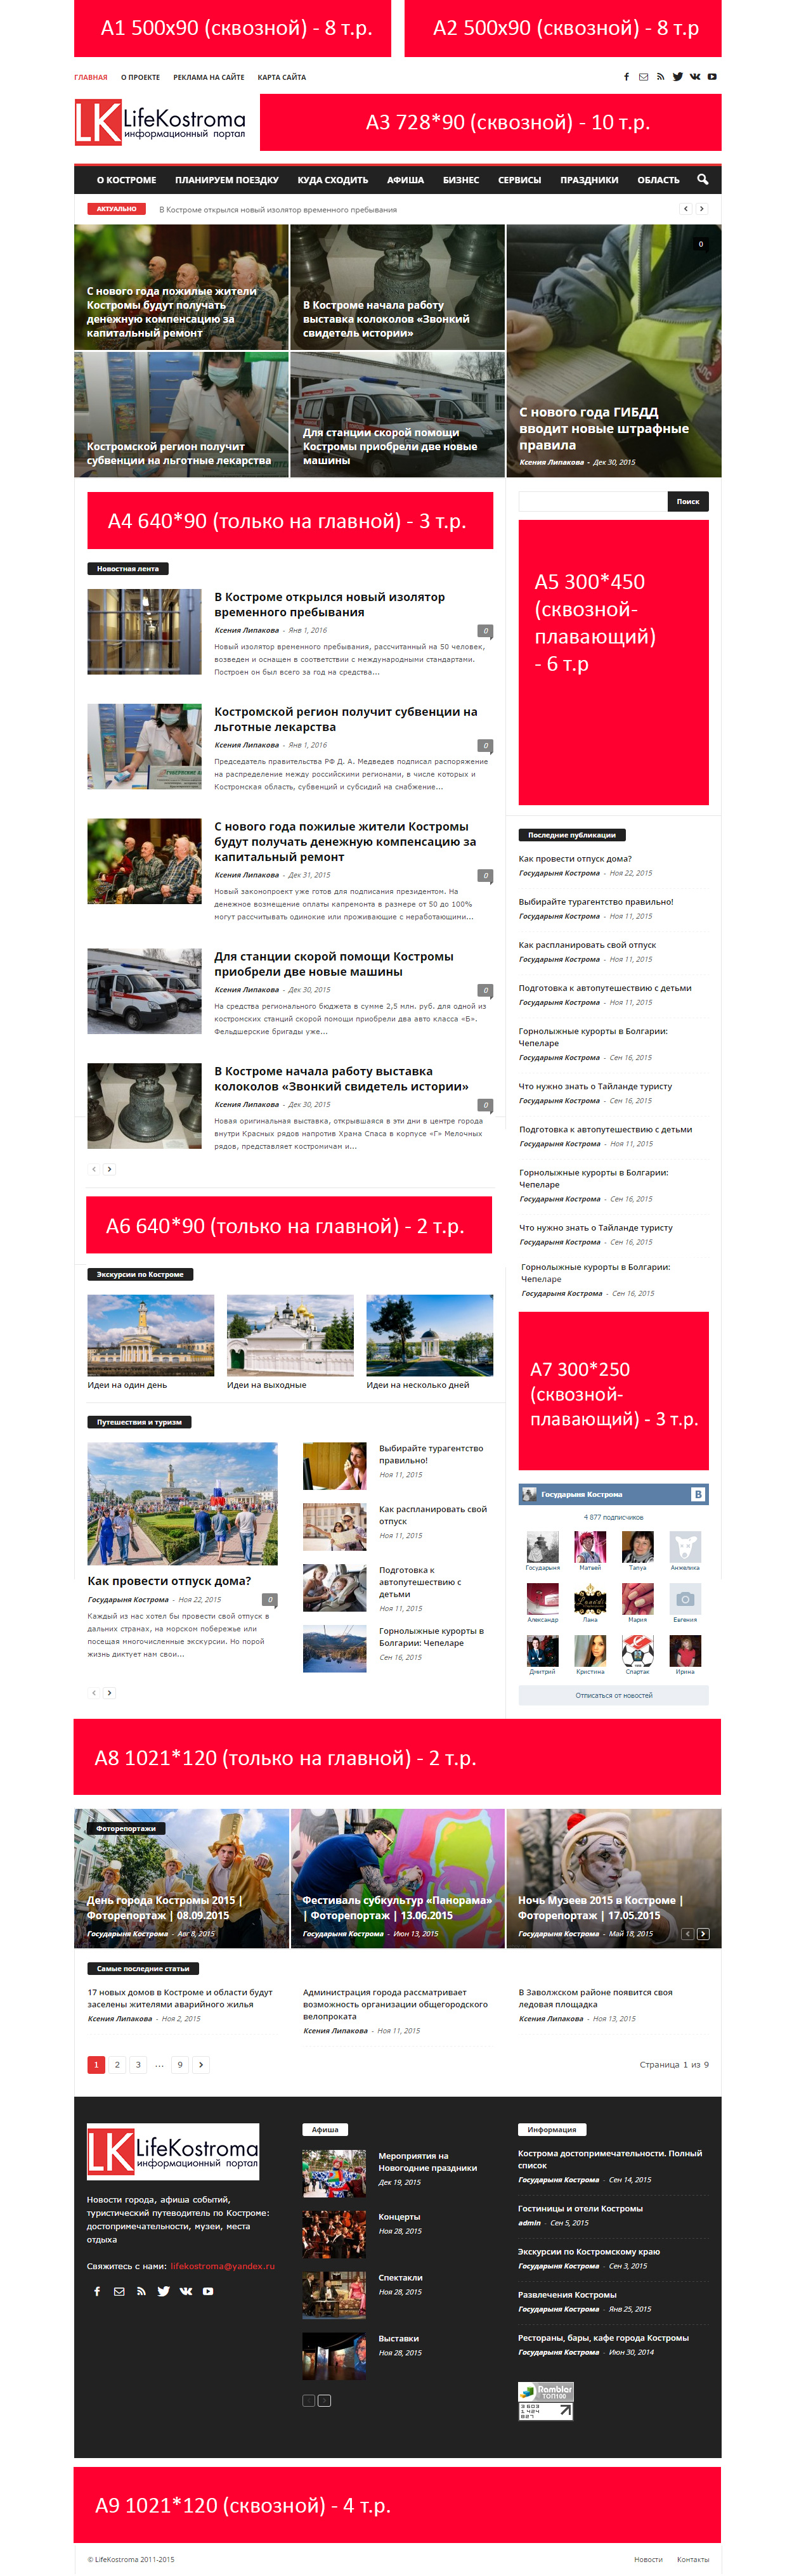 reklama-lifekostroma.ru-1